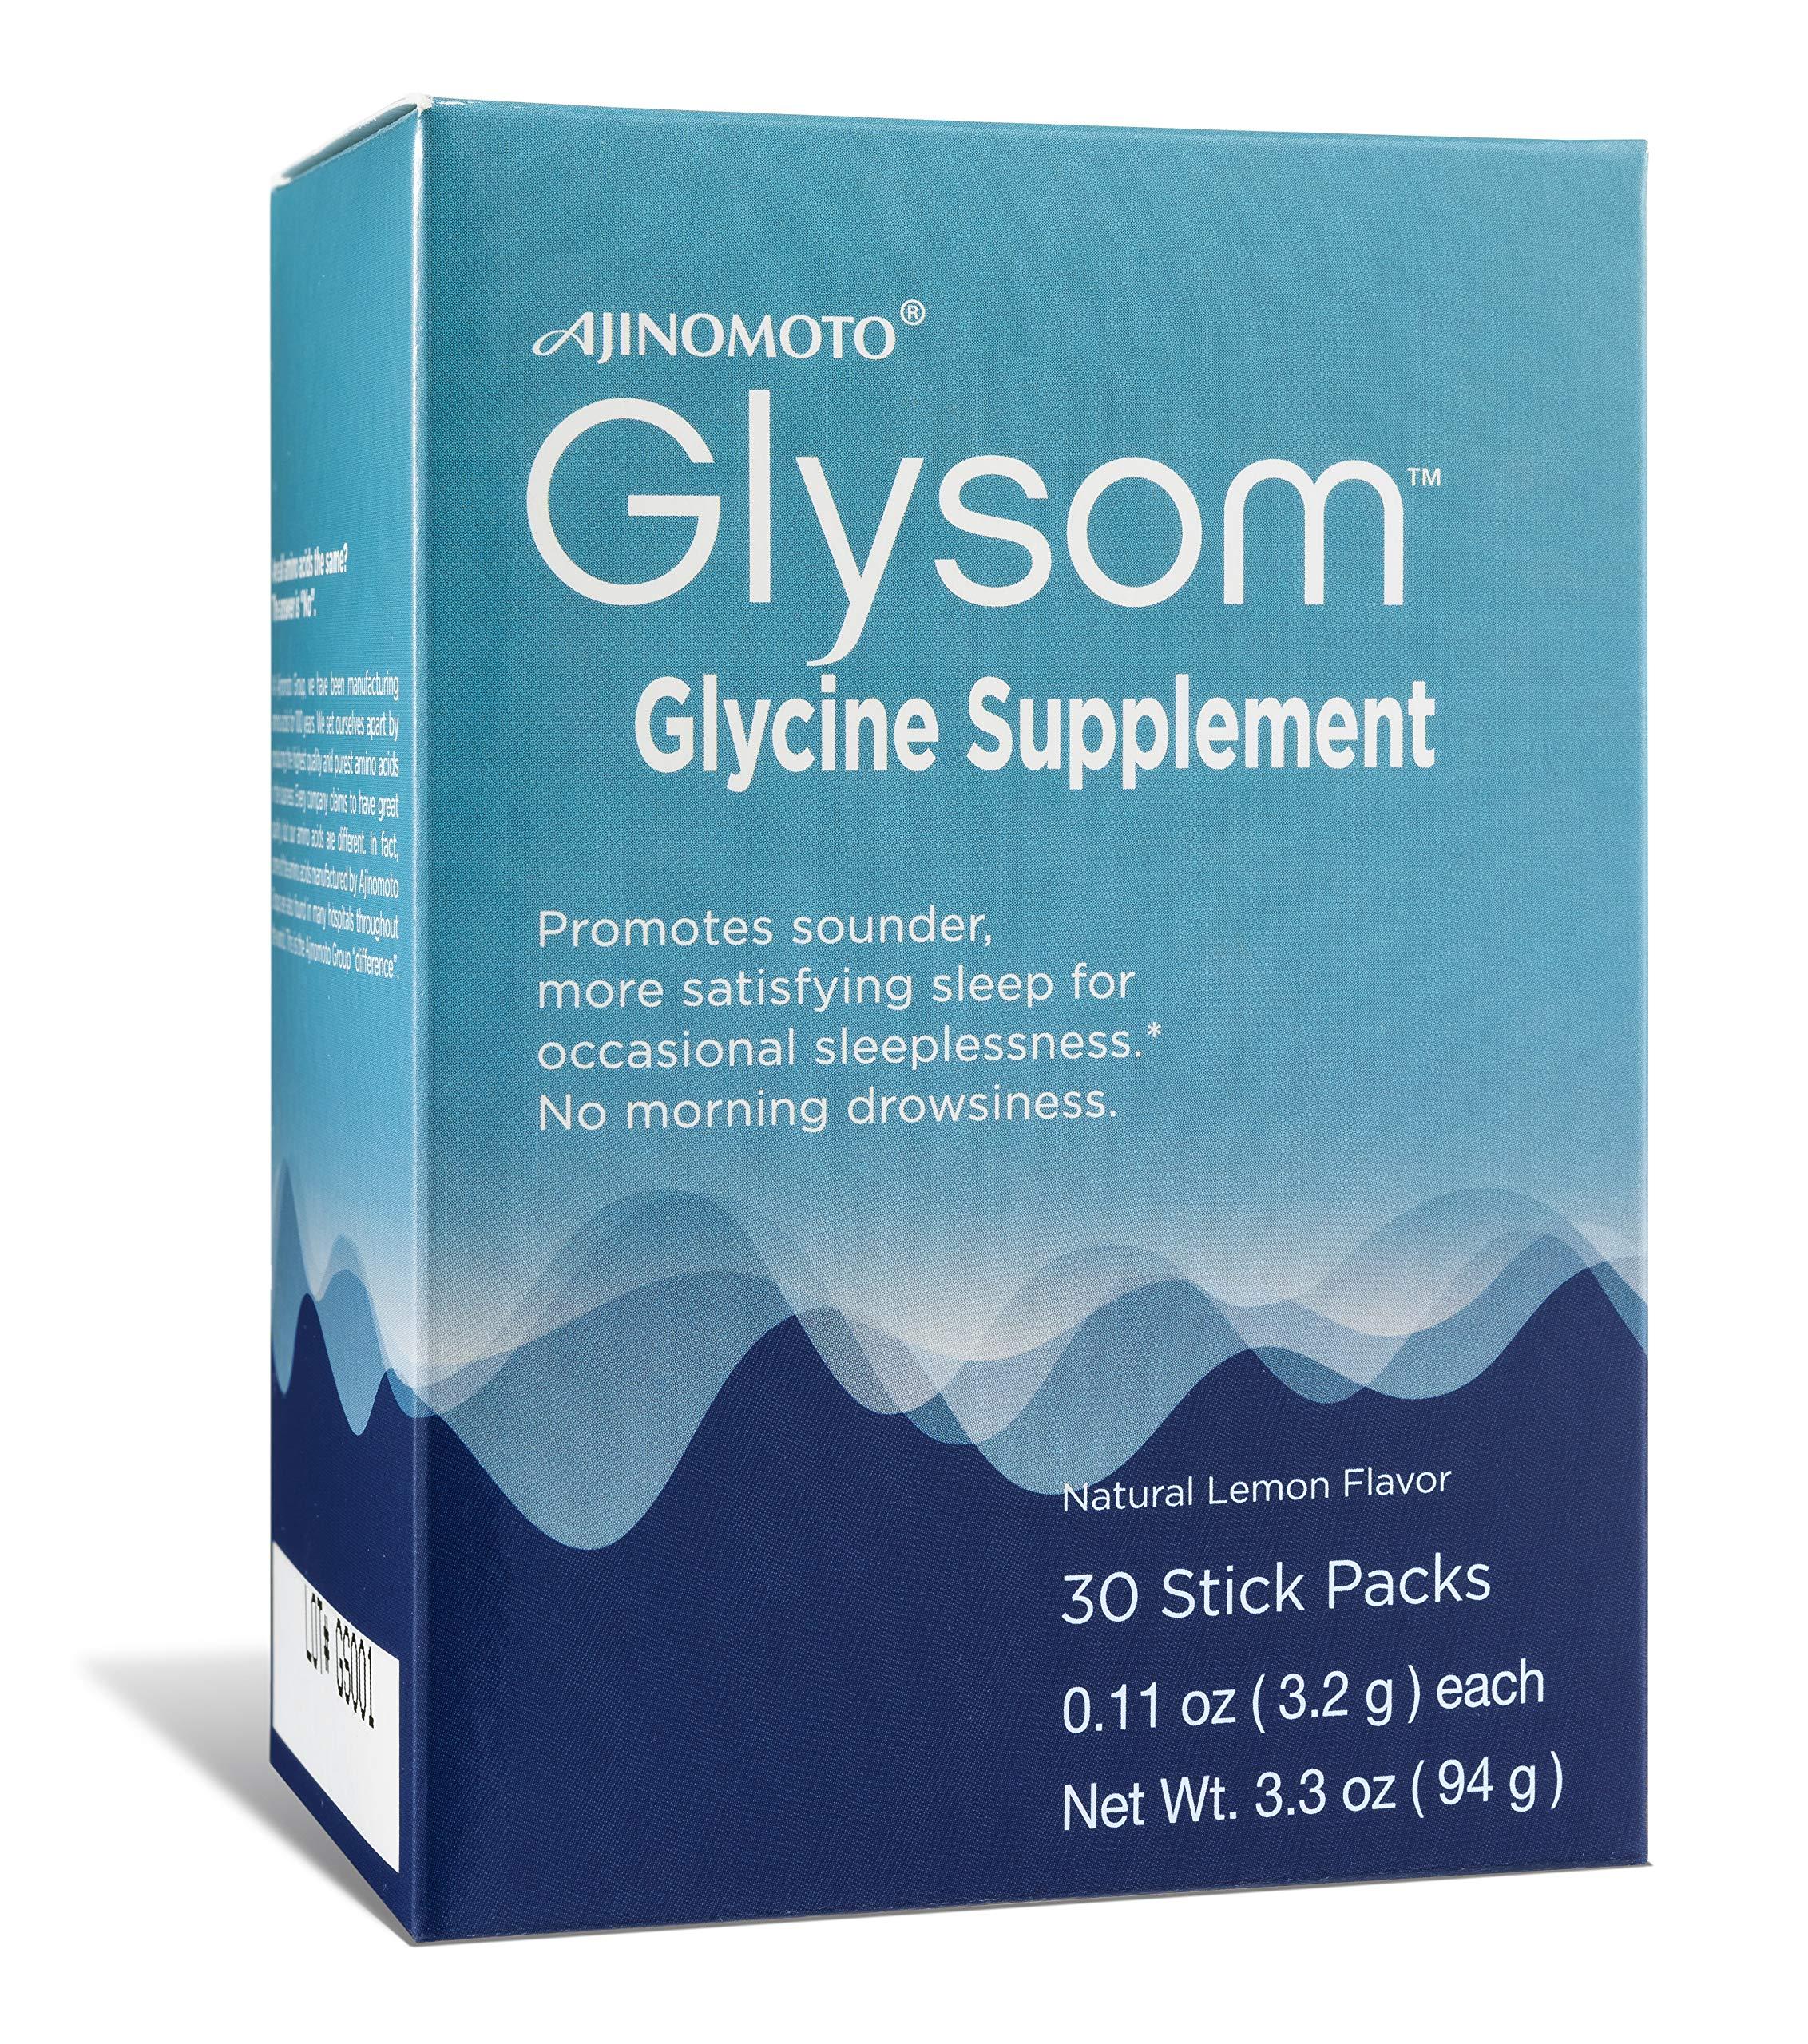 Glysom - Gylcine Sleep Supplement, Amino Acid Powder, Natural Lemon Flavor, 30 x 3.2g Sticks, 3.3oz Box